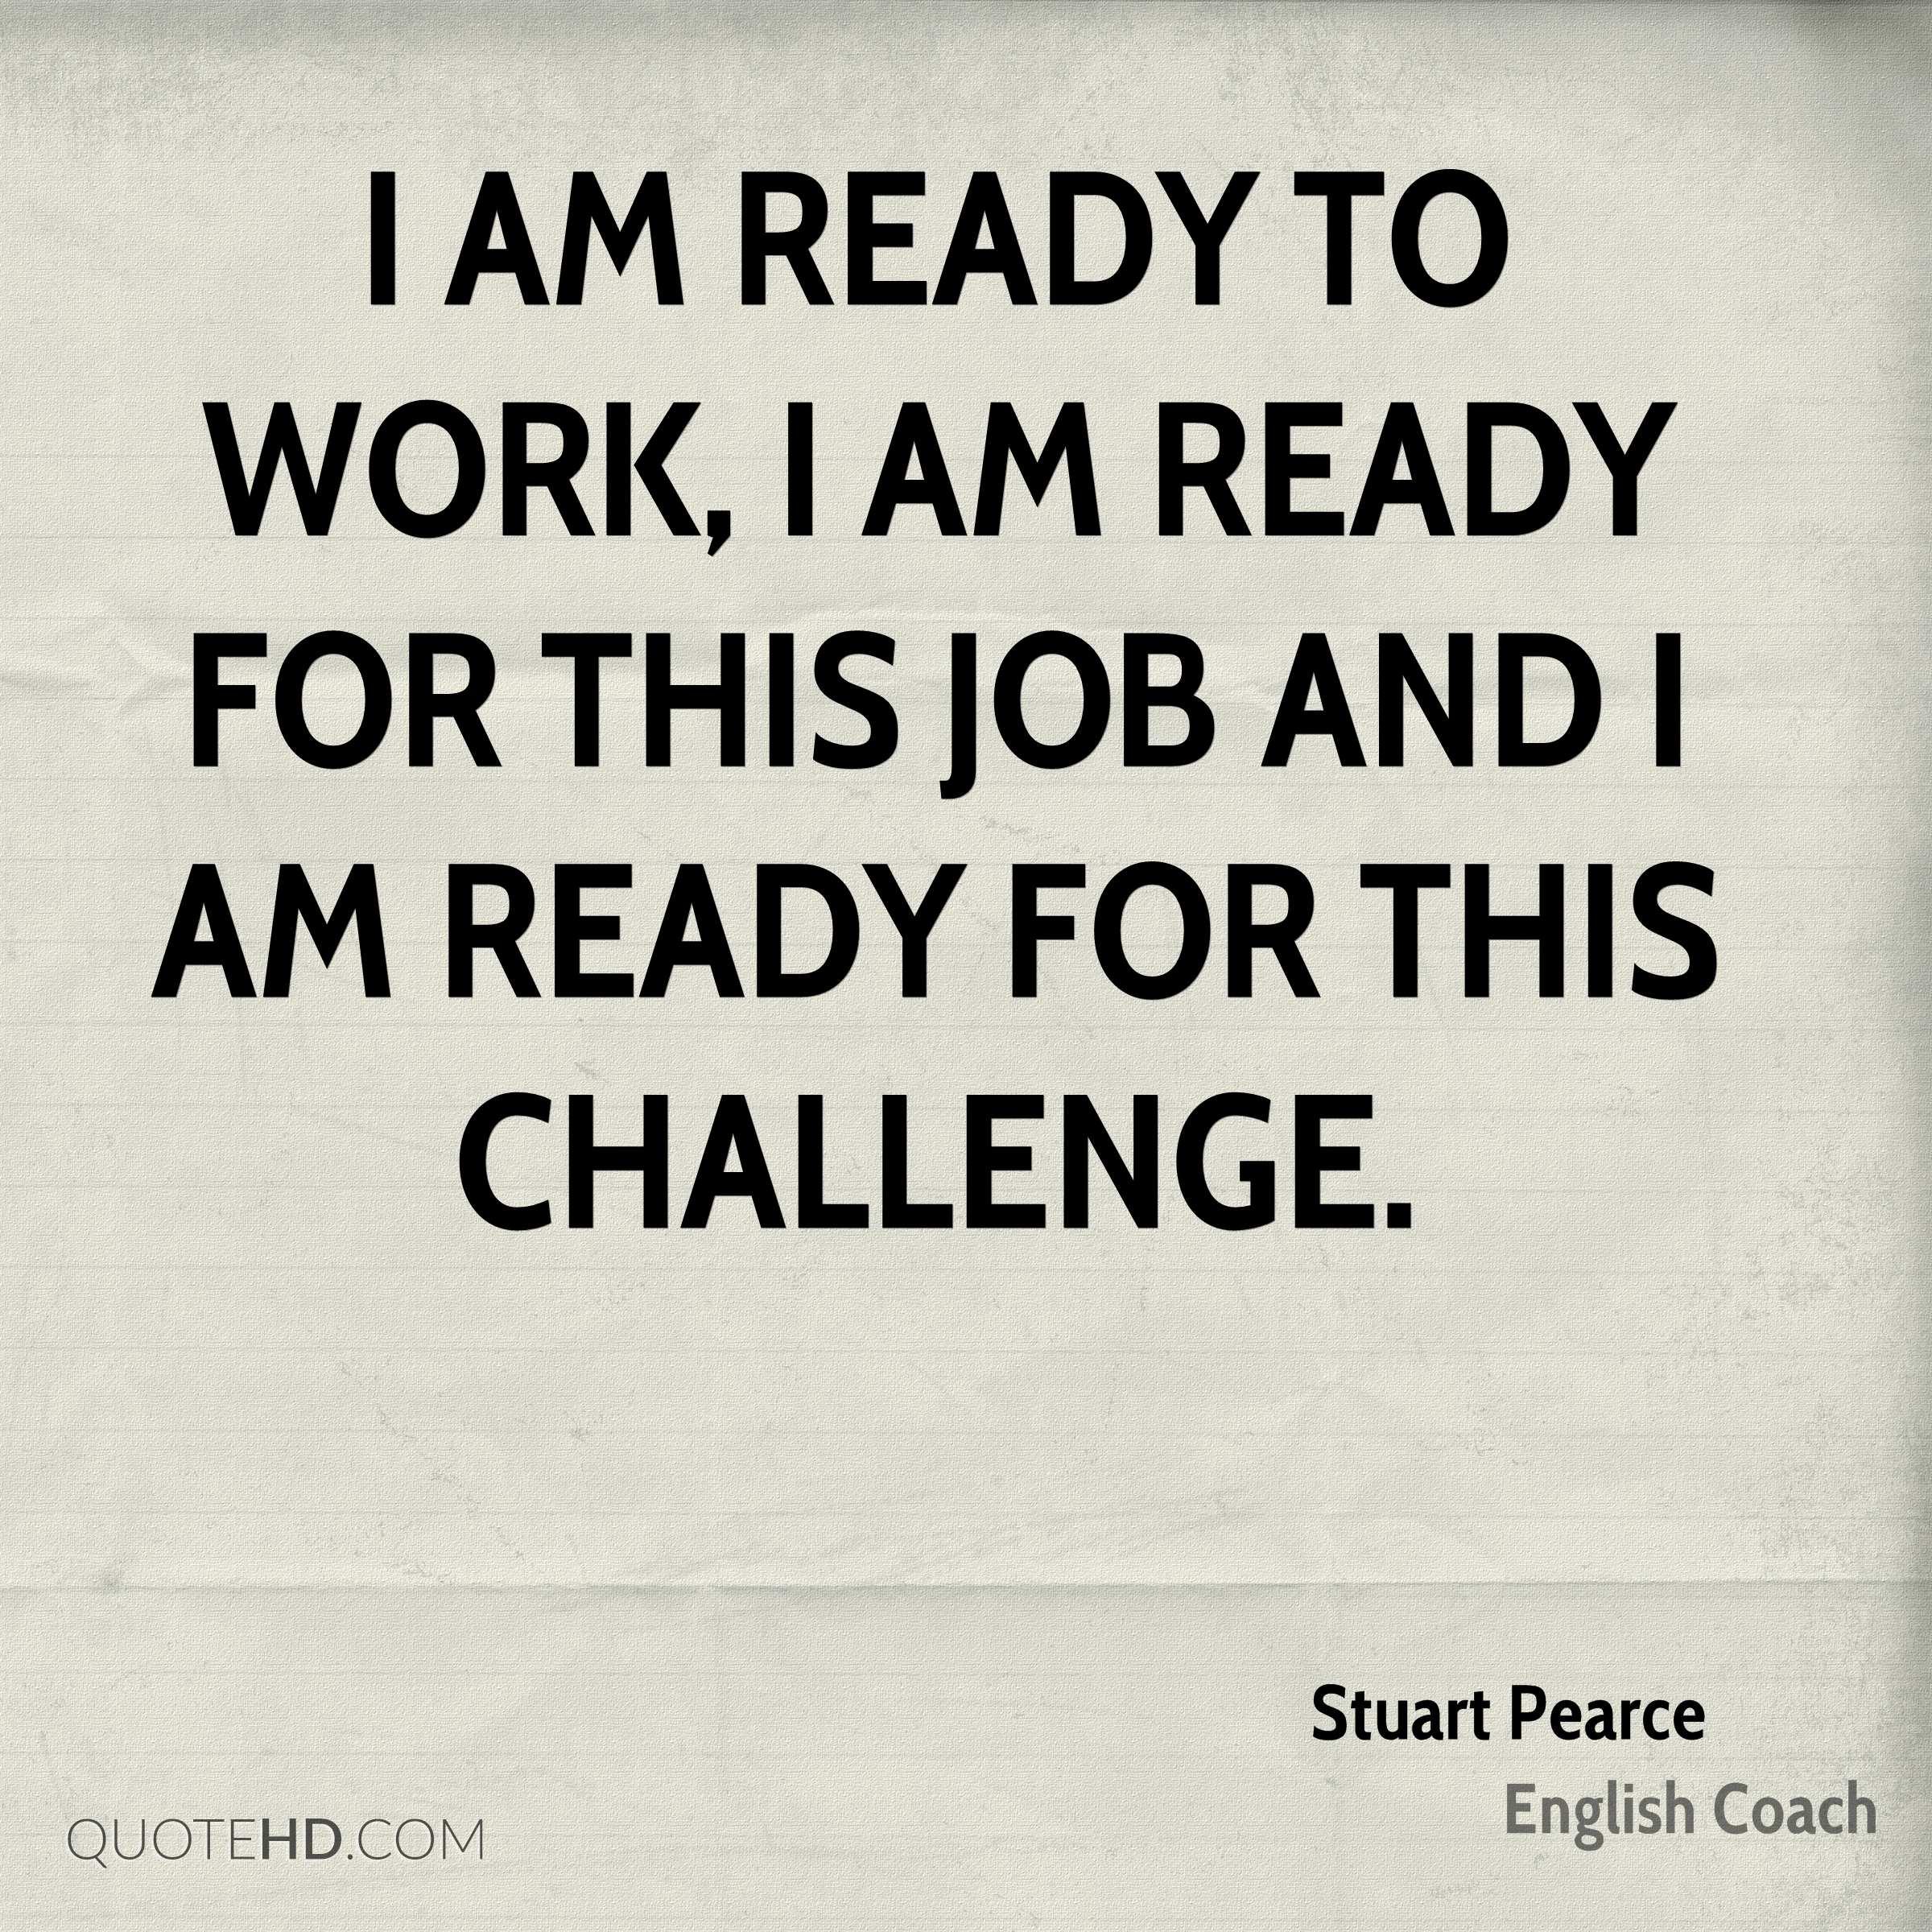 Stuart Pearce Quotes | QuoteHD